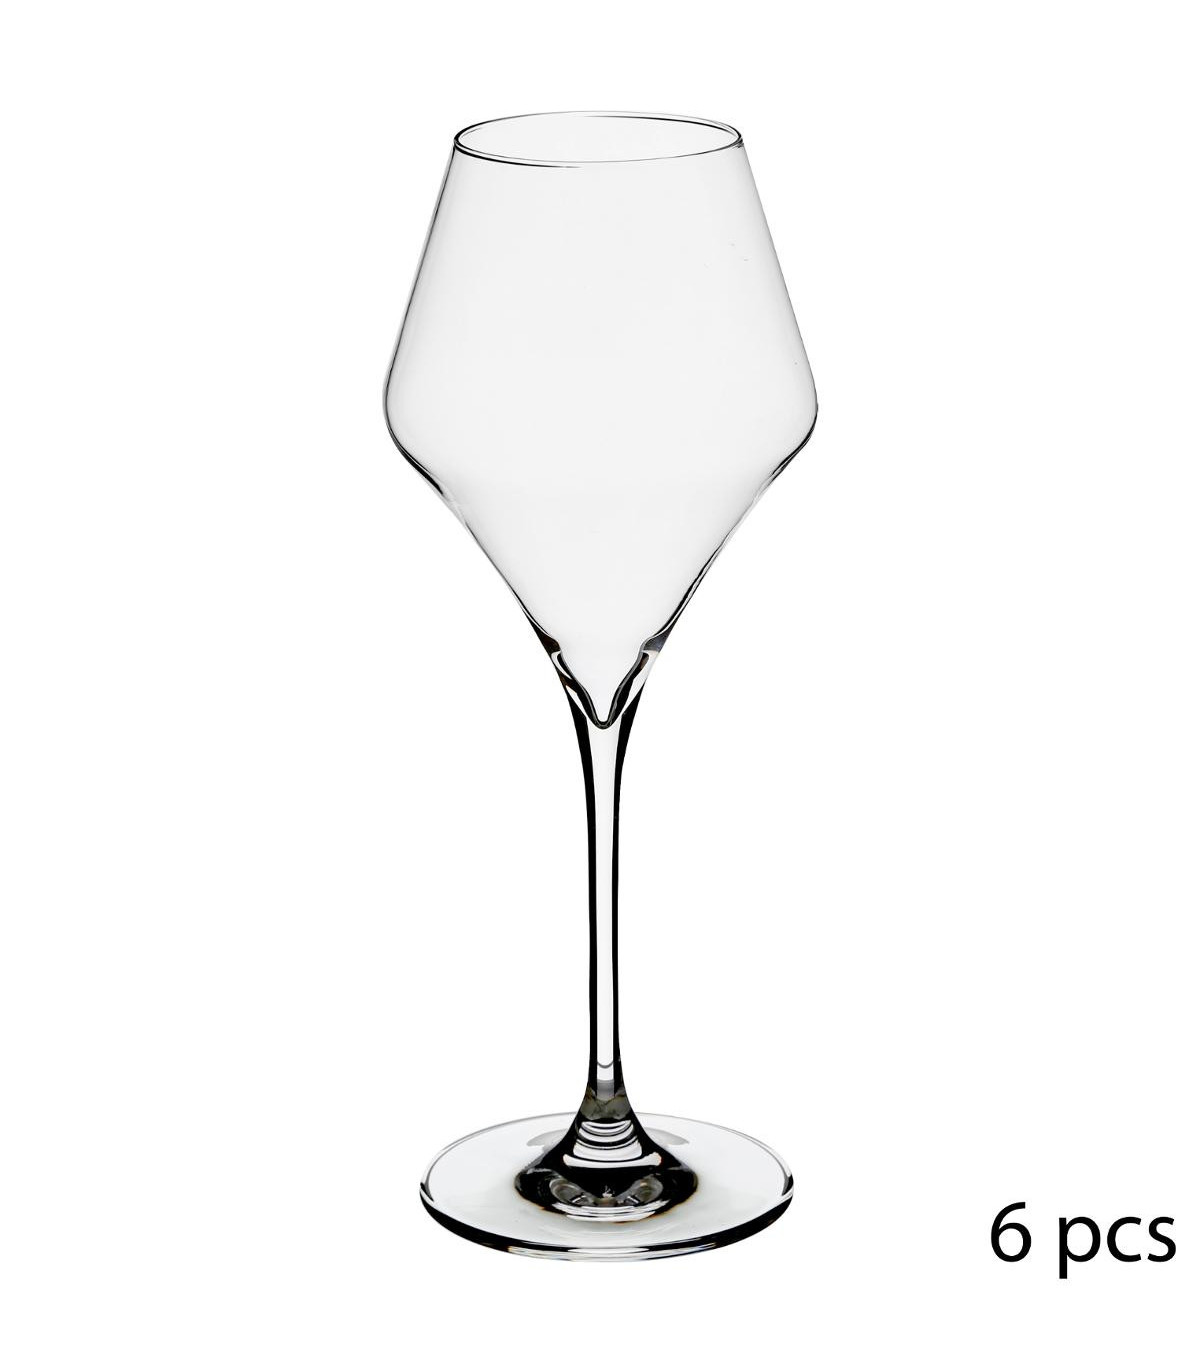 Verre à vin en Cristallin X6 CLARILLO 27CL